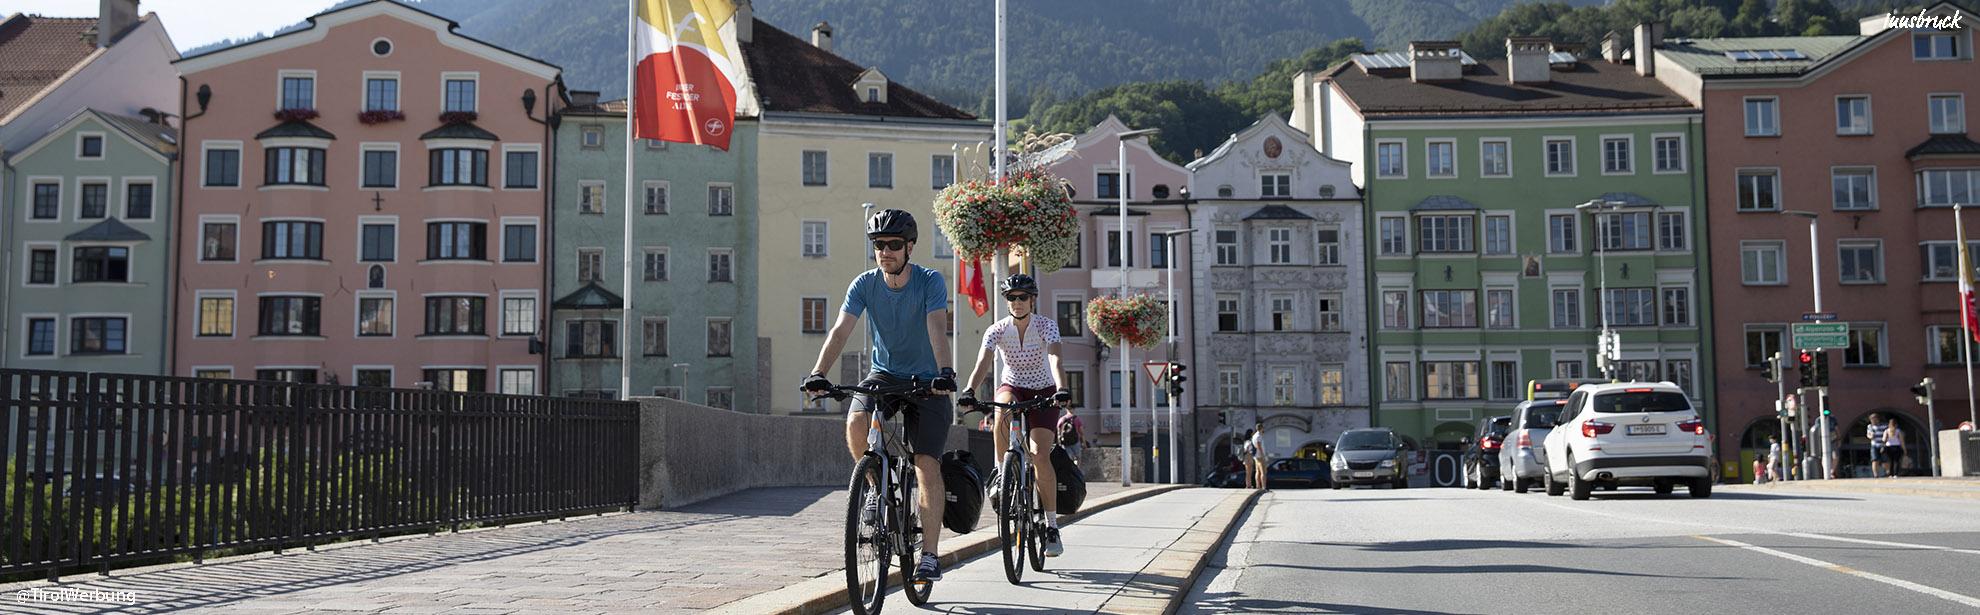 OTirolWerbung_Innsbruck_1226492